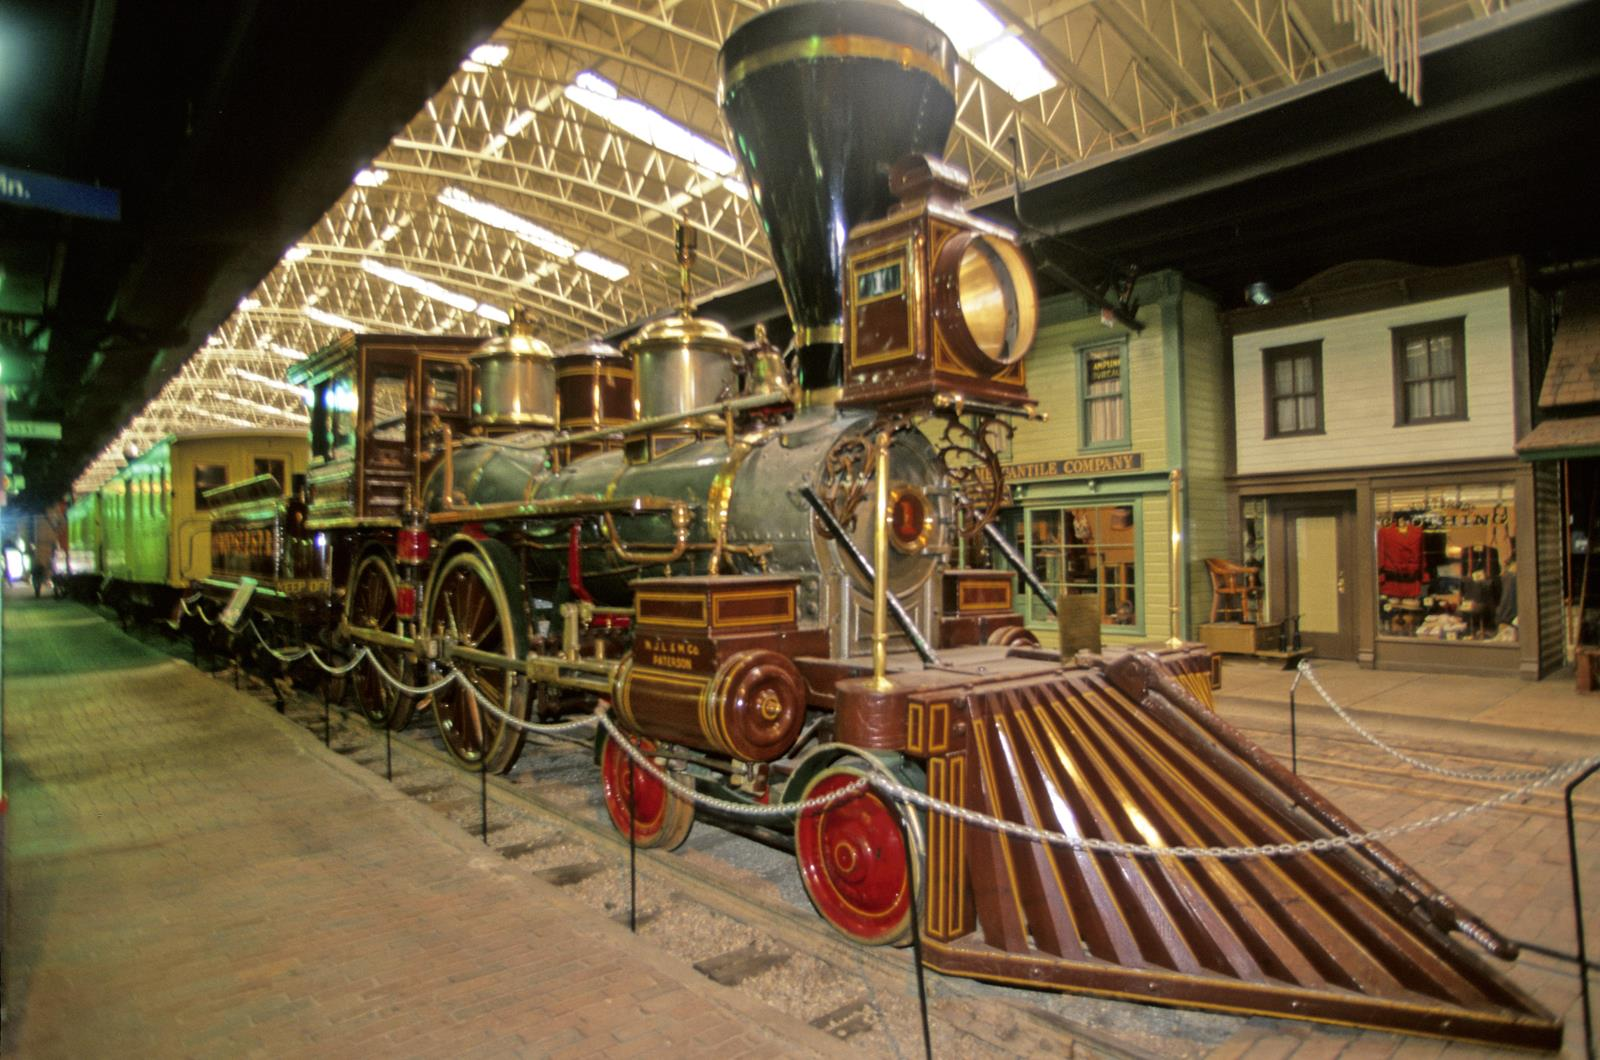 Lake Superior Railroad Museum in Duluth